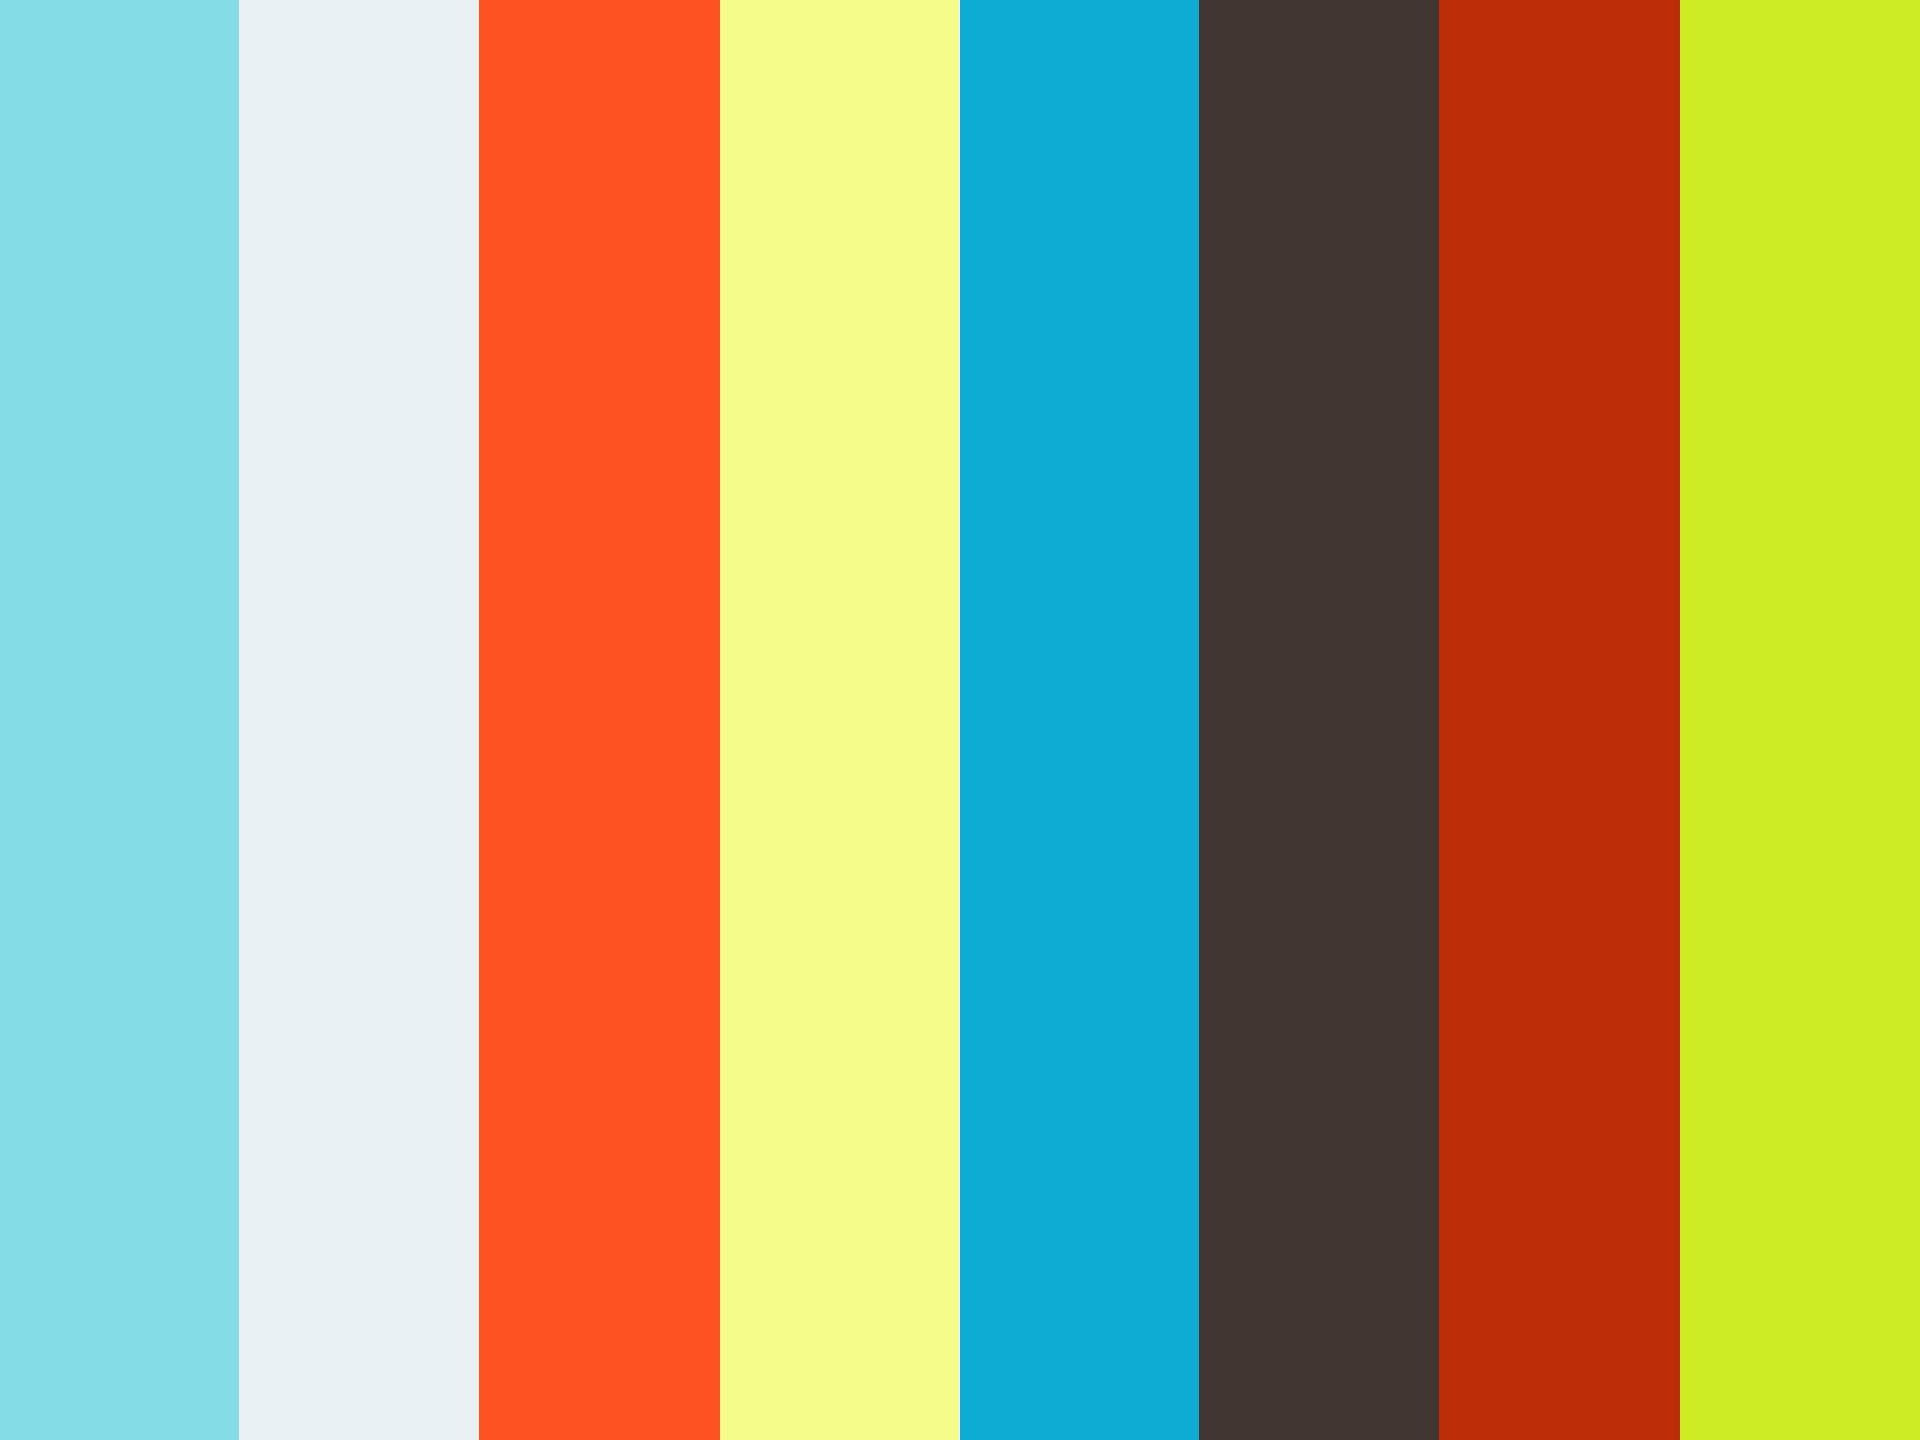 686 x Mike Shinoda Part 1: Design Philosophy